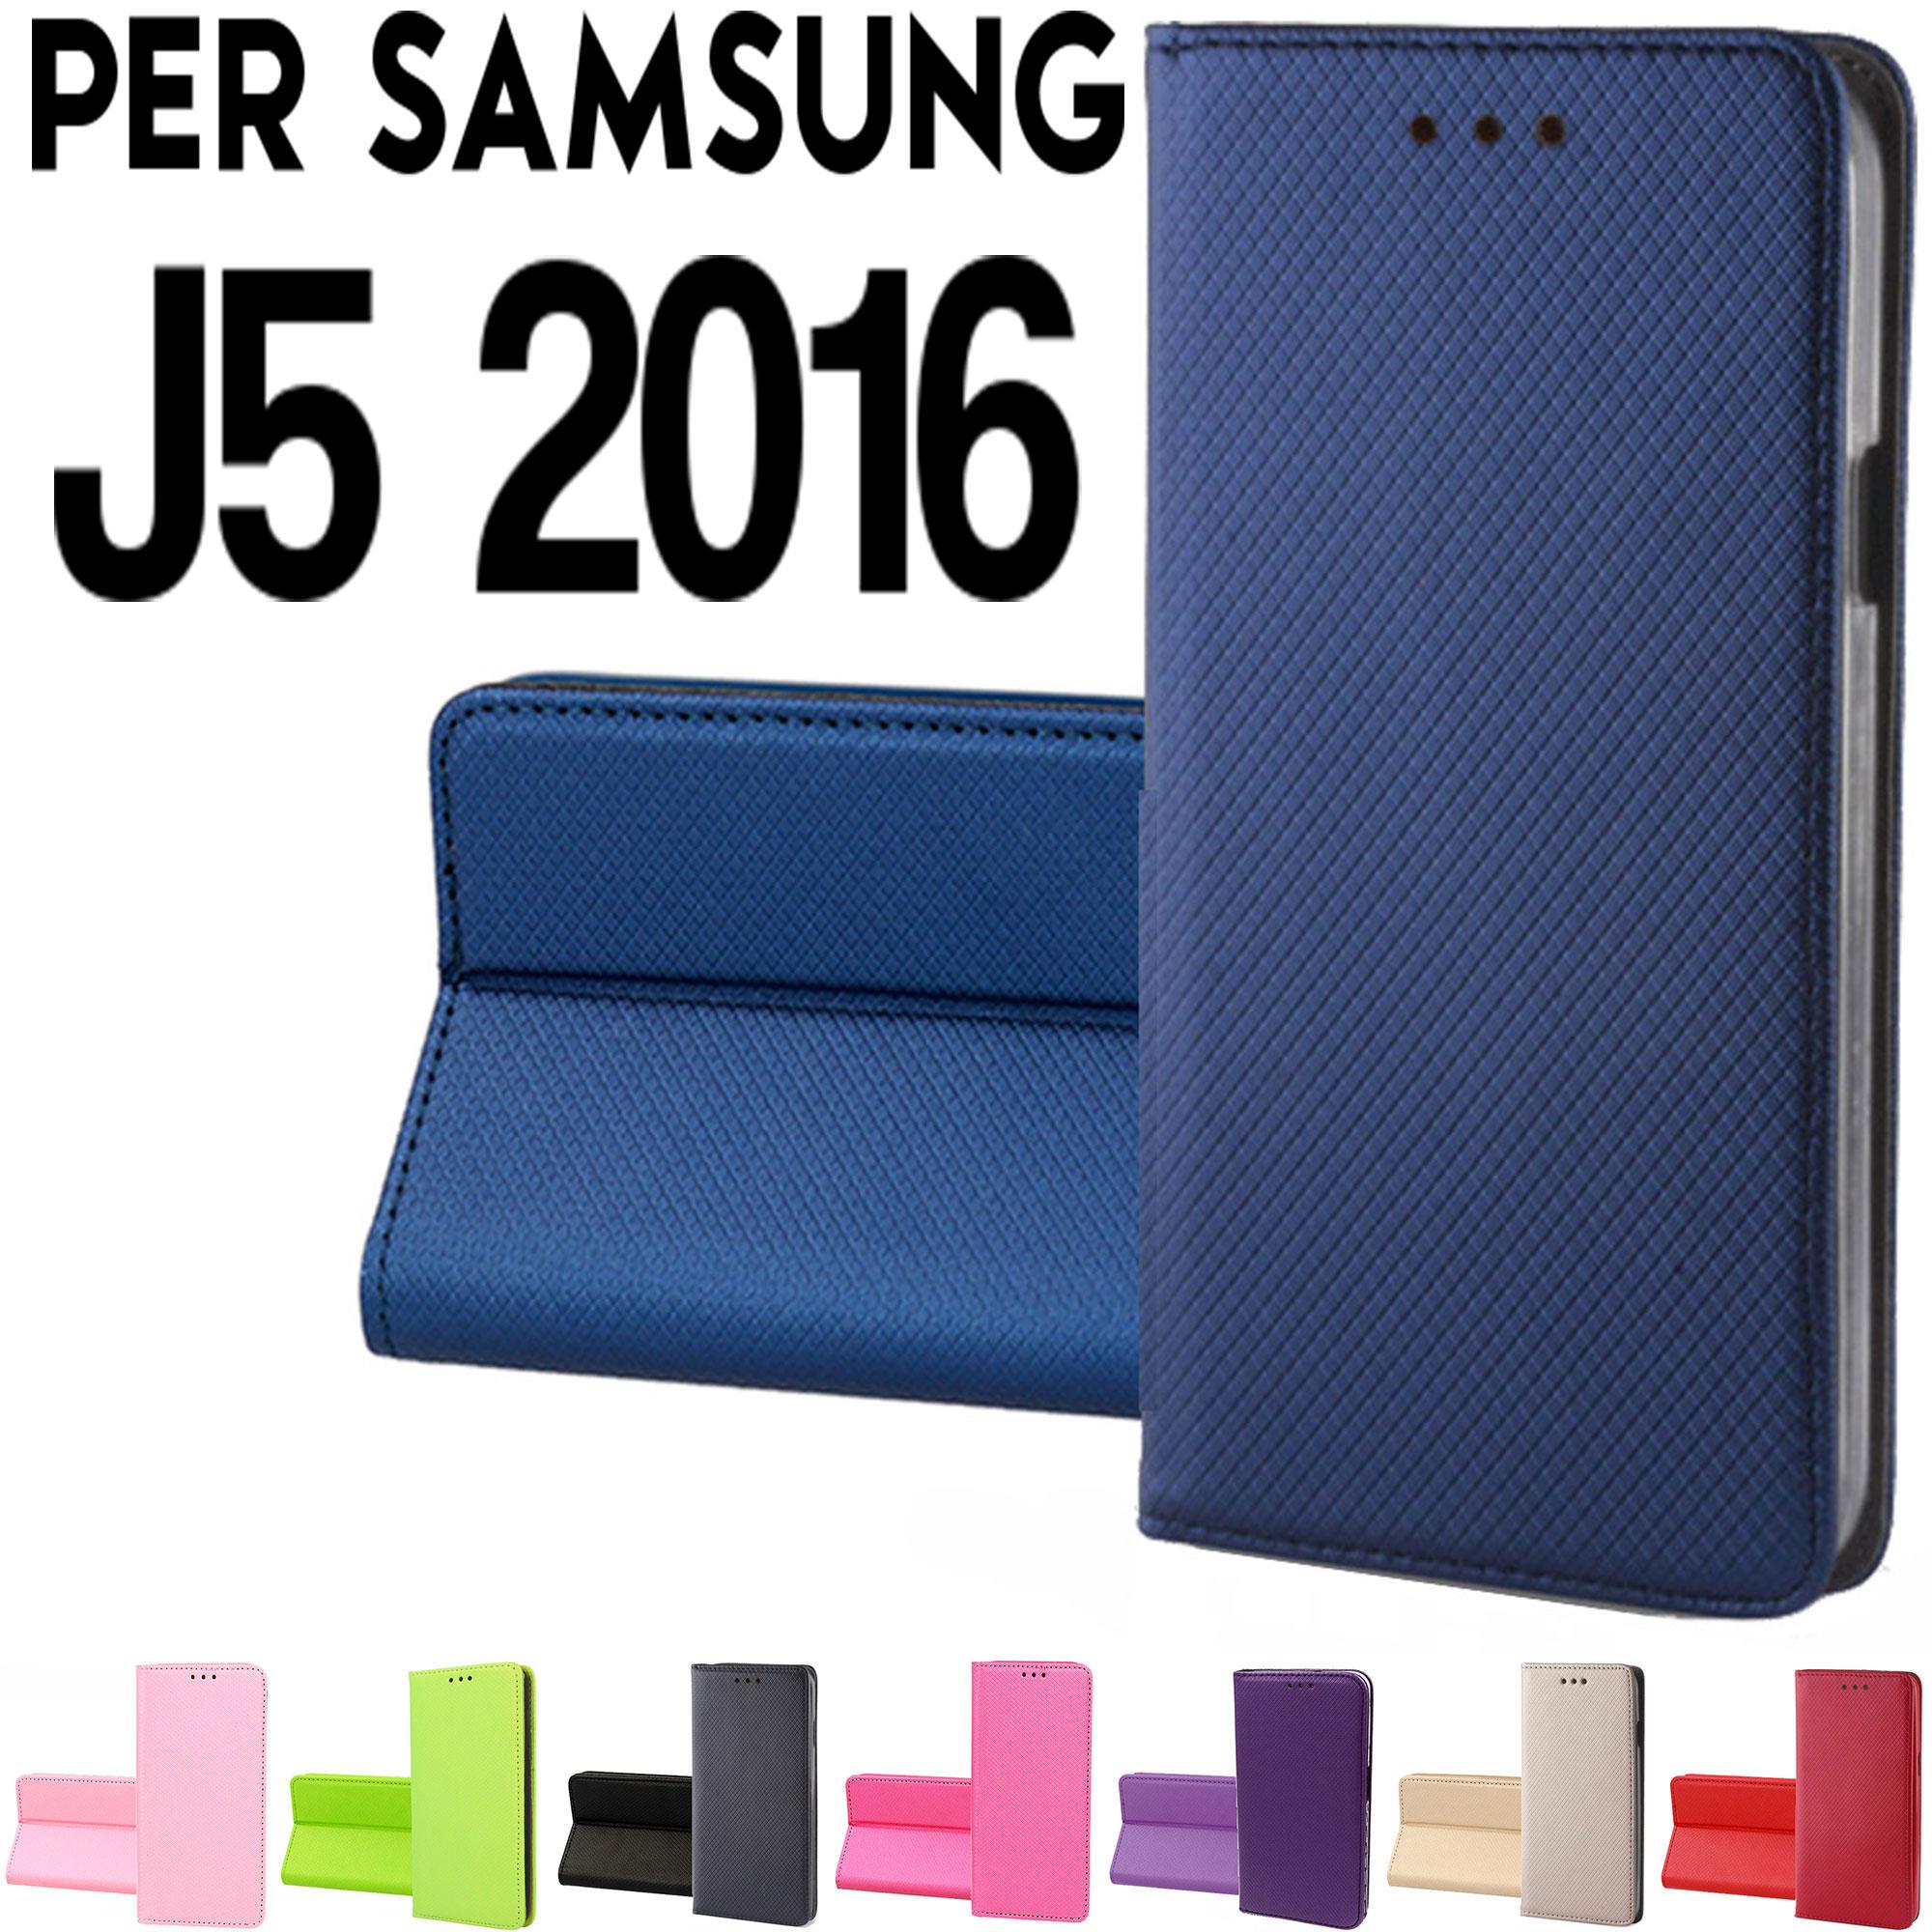 custodia libro samsung j5 2016